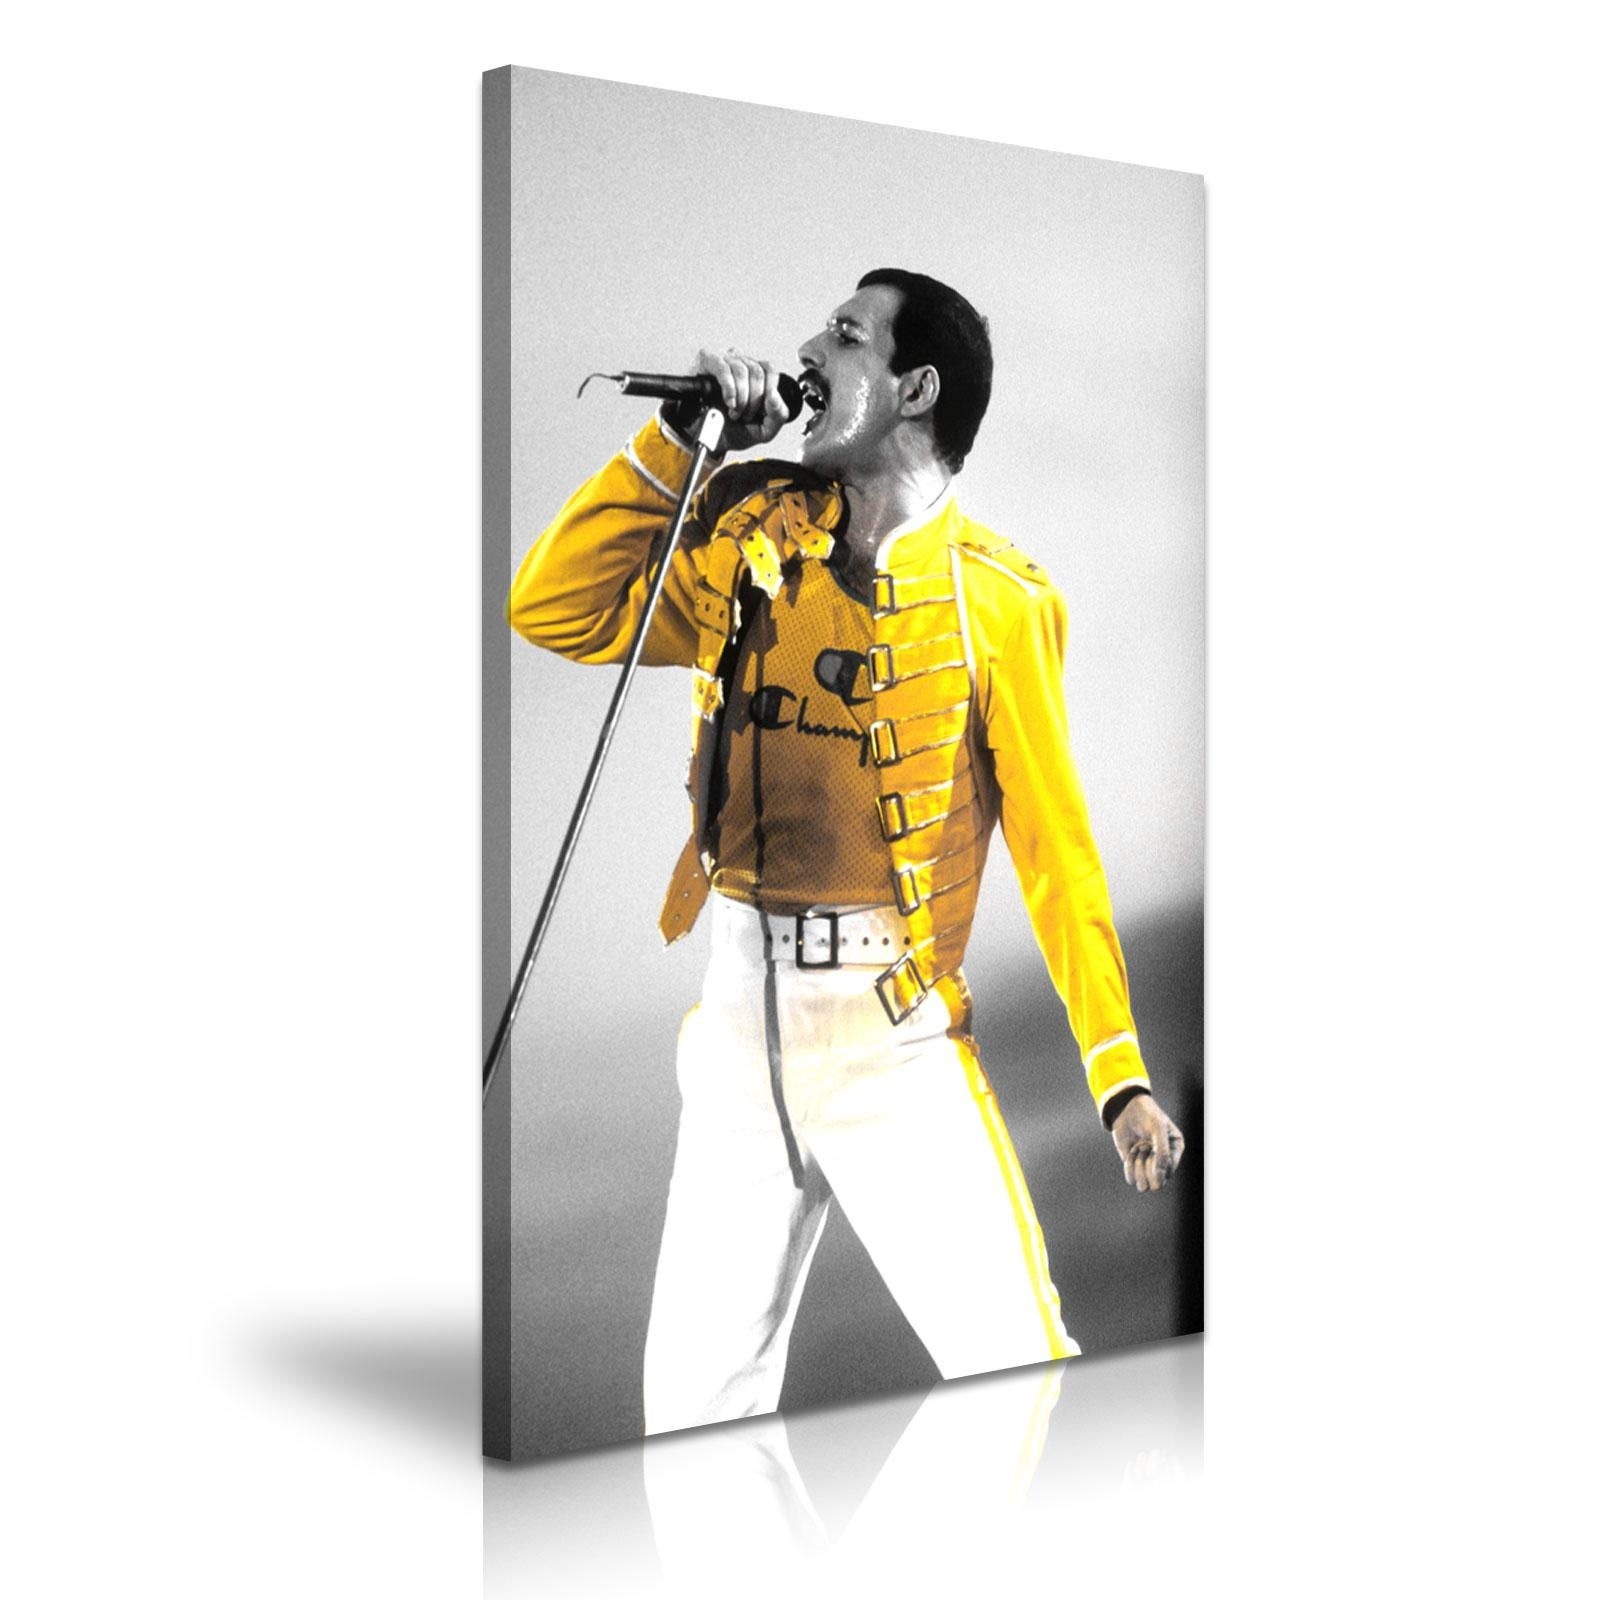 Music & Dance Freddie Mercury Queen Canvas Framed Print Wall Art With Regard To Freddie Mercury Wall Art (View 19 of 20)